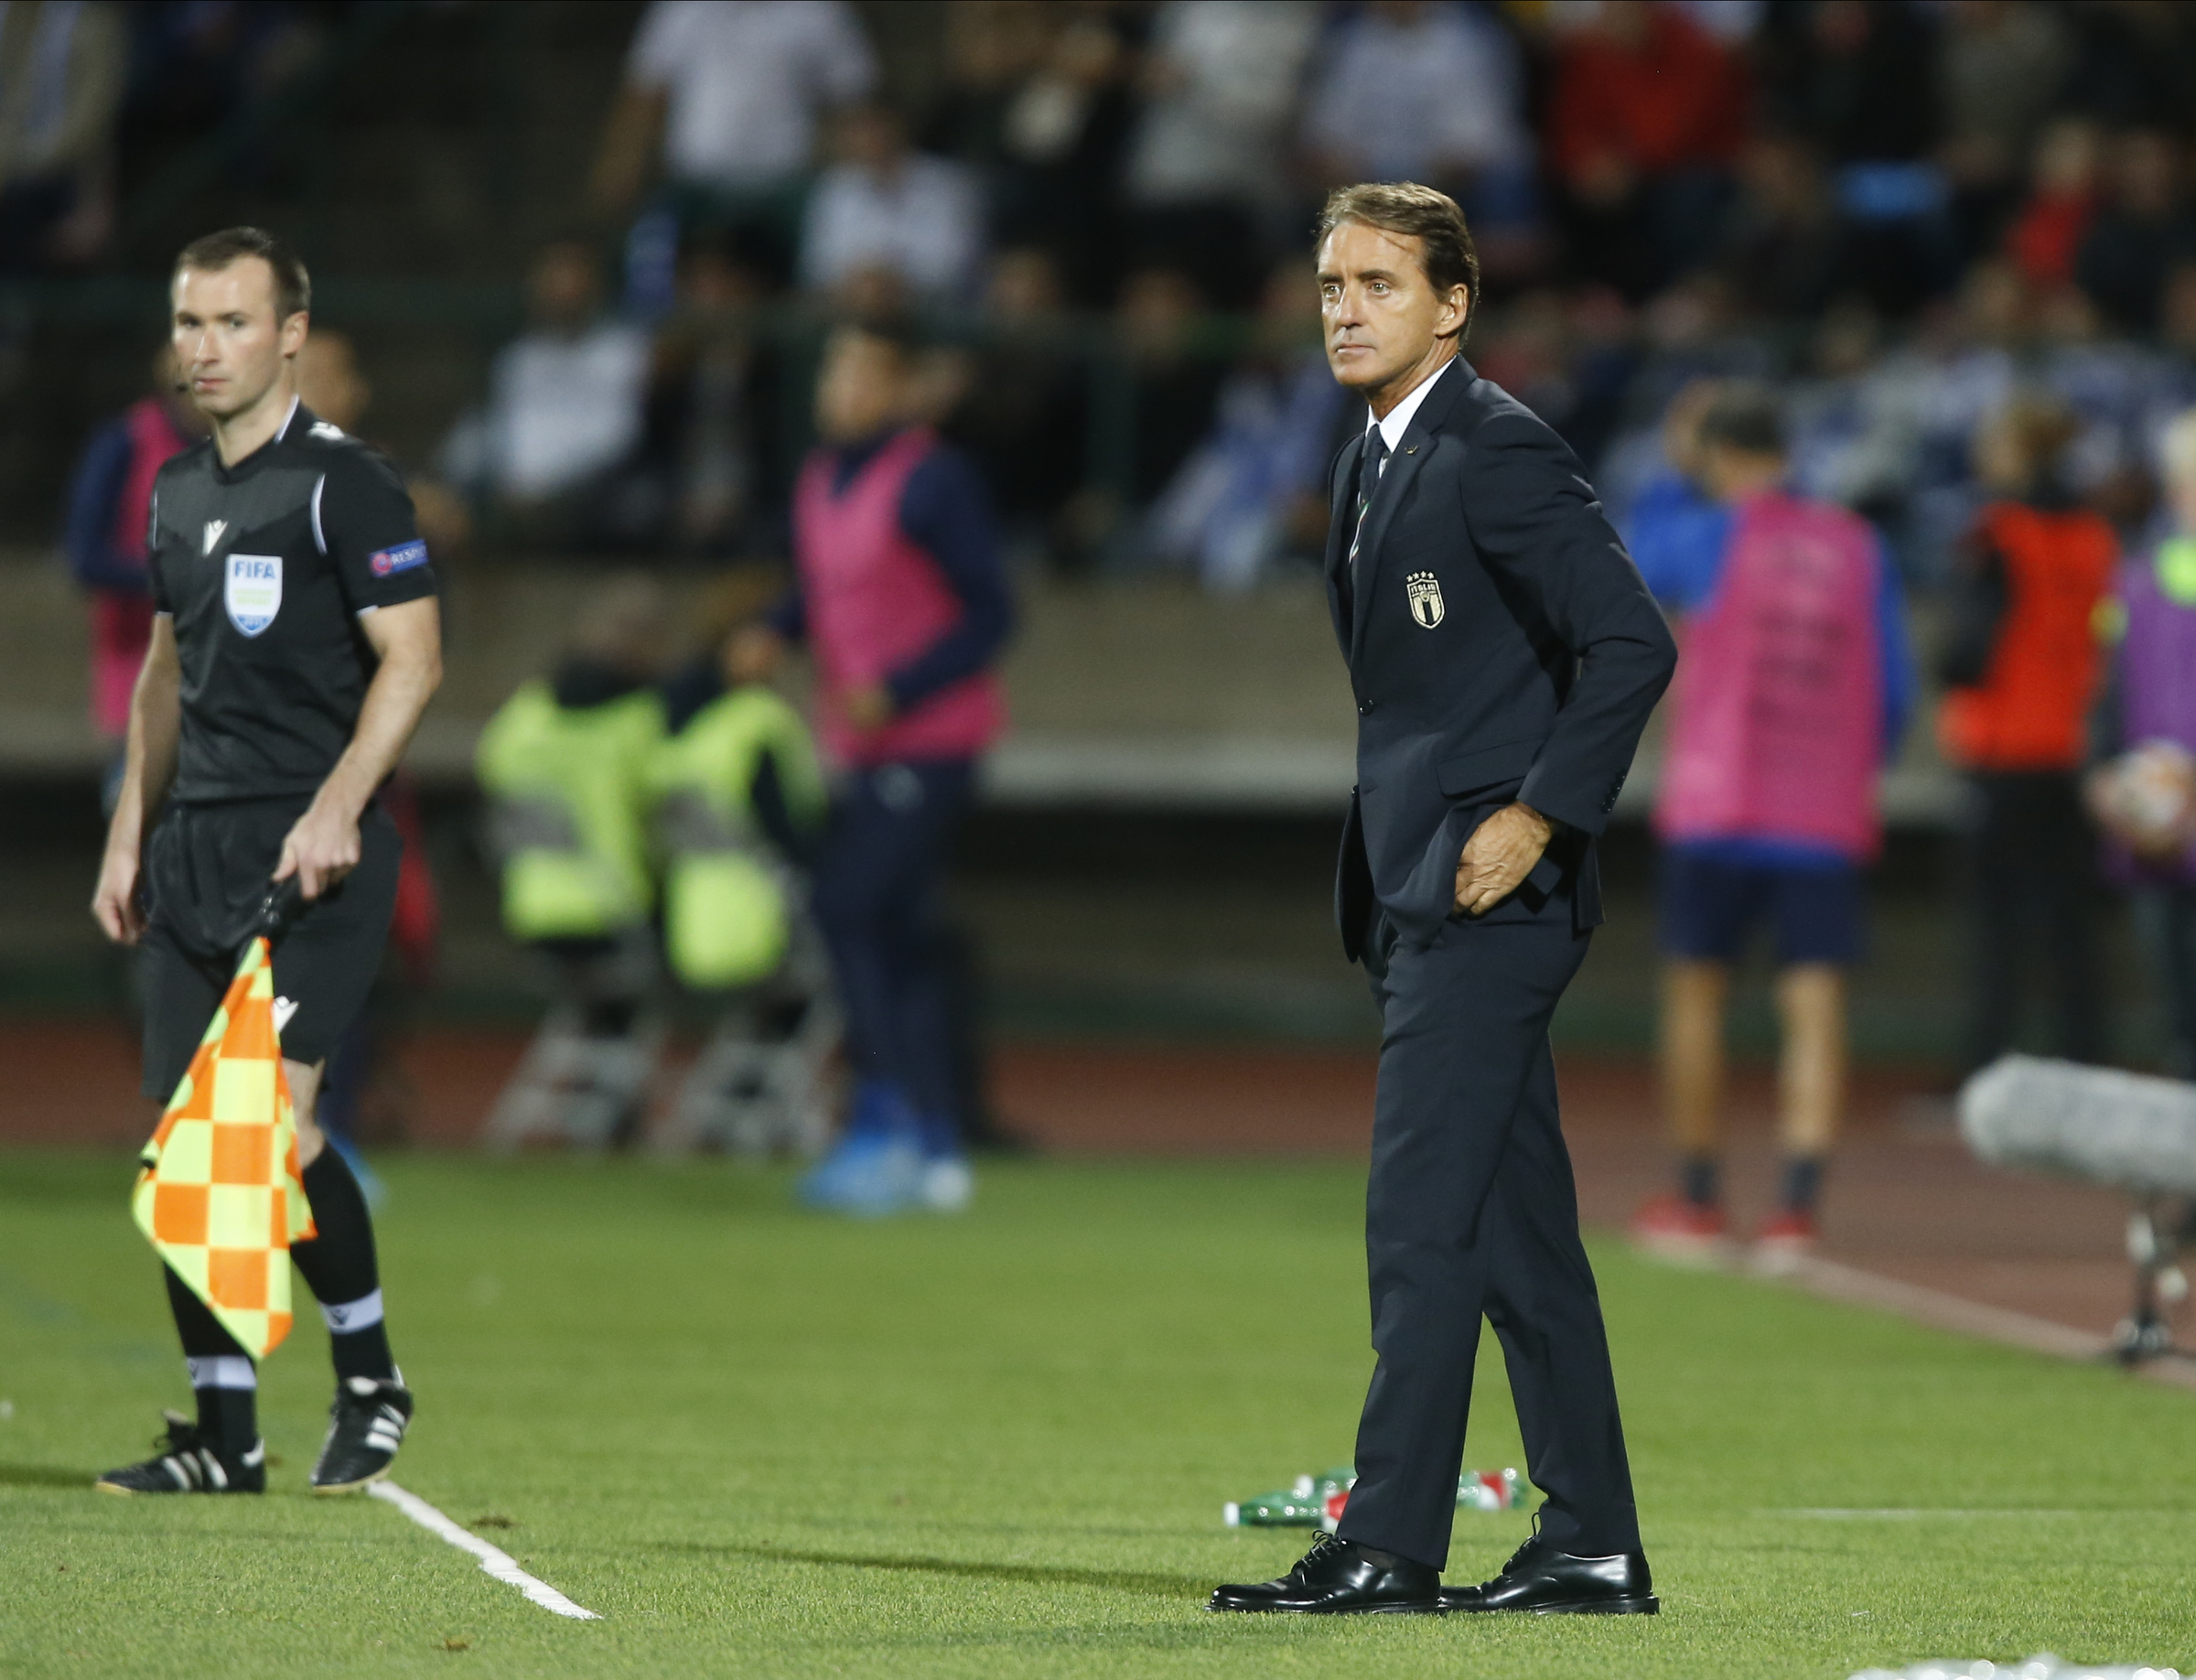 LIVE Italia-Moldavia 6-0, amichevole in DIRETTA. Azzurri devastanti, doppietta per El Shaarawy